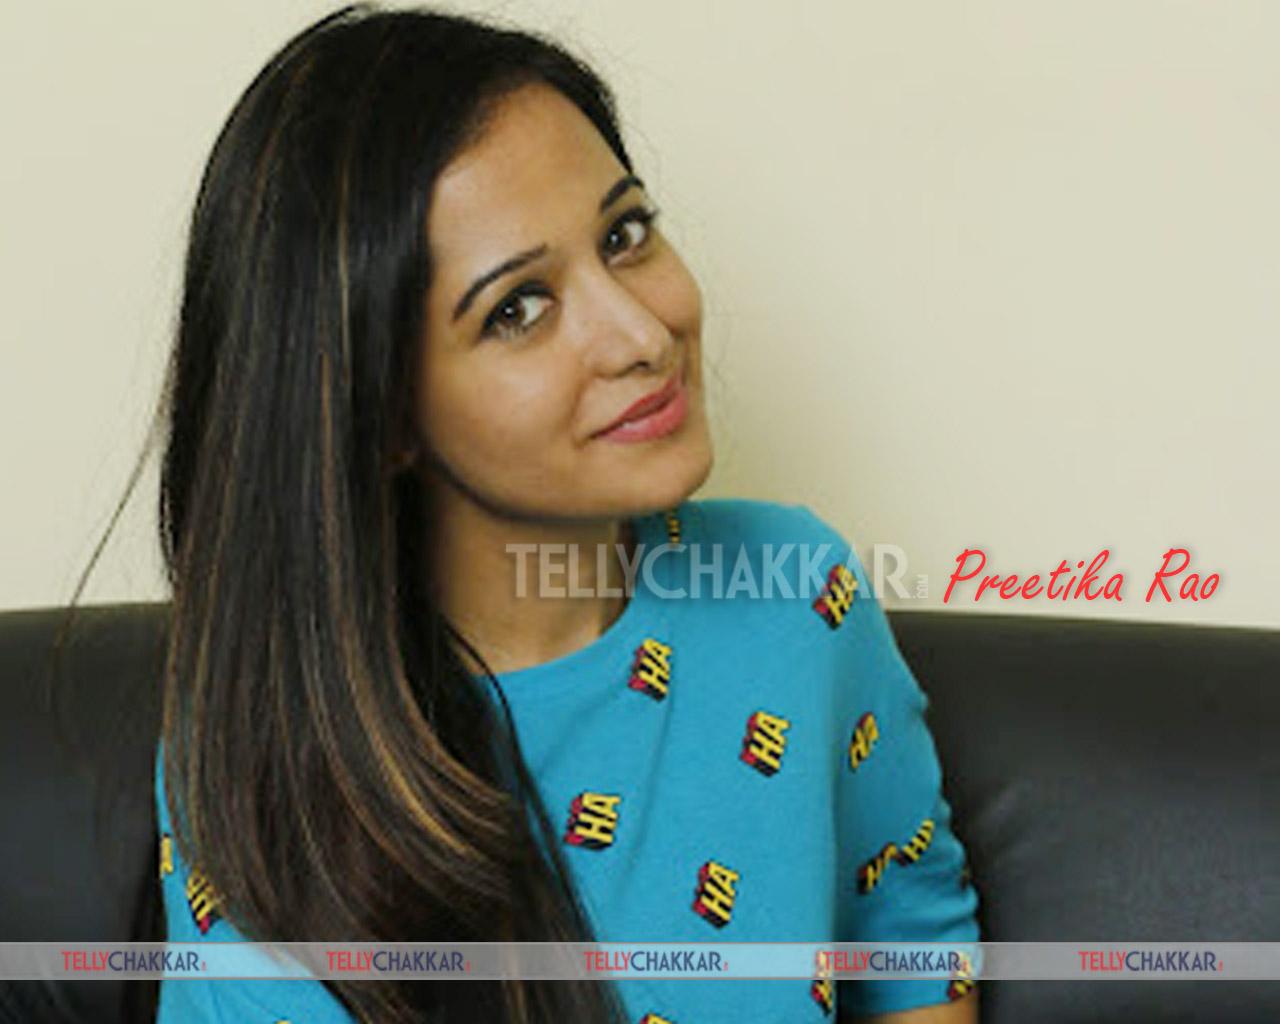 Preetika Rao Preetika Rao new pictures